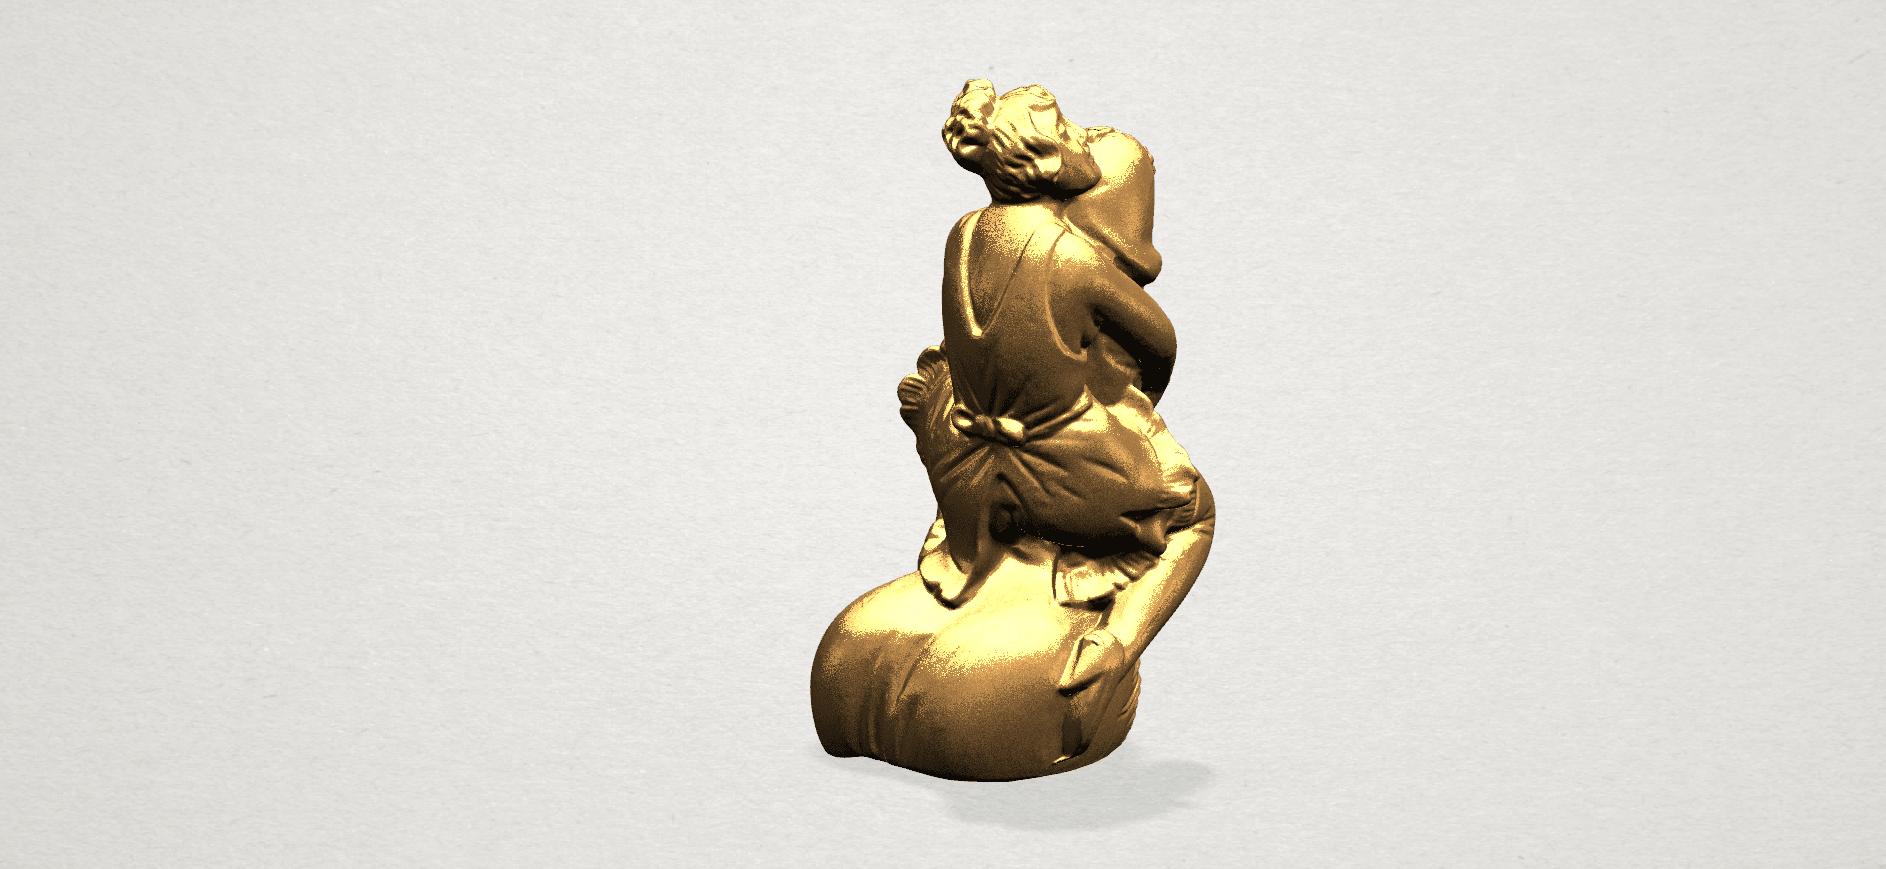 Alice hugging Dick - C03.png Download free STL file Alice hugging Dick • 3D printer design, GeorgesNikkei